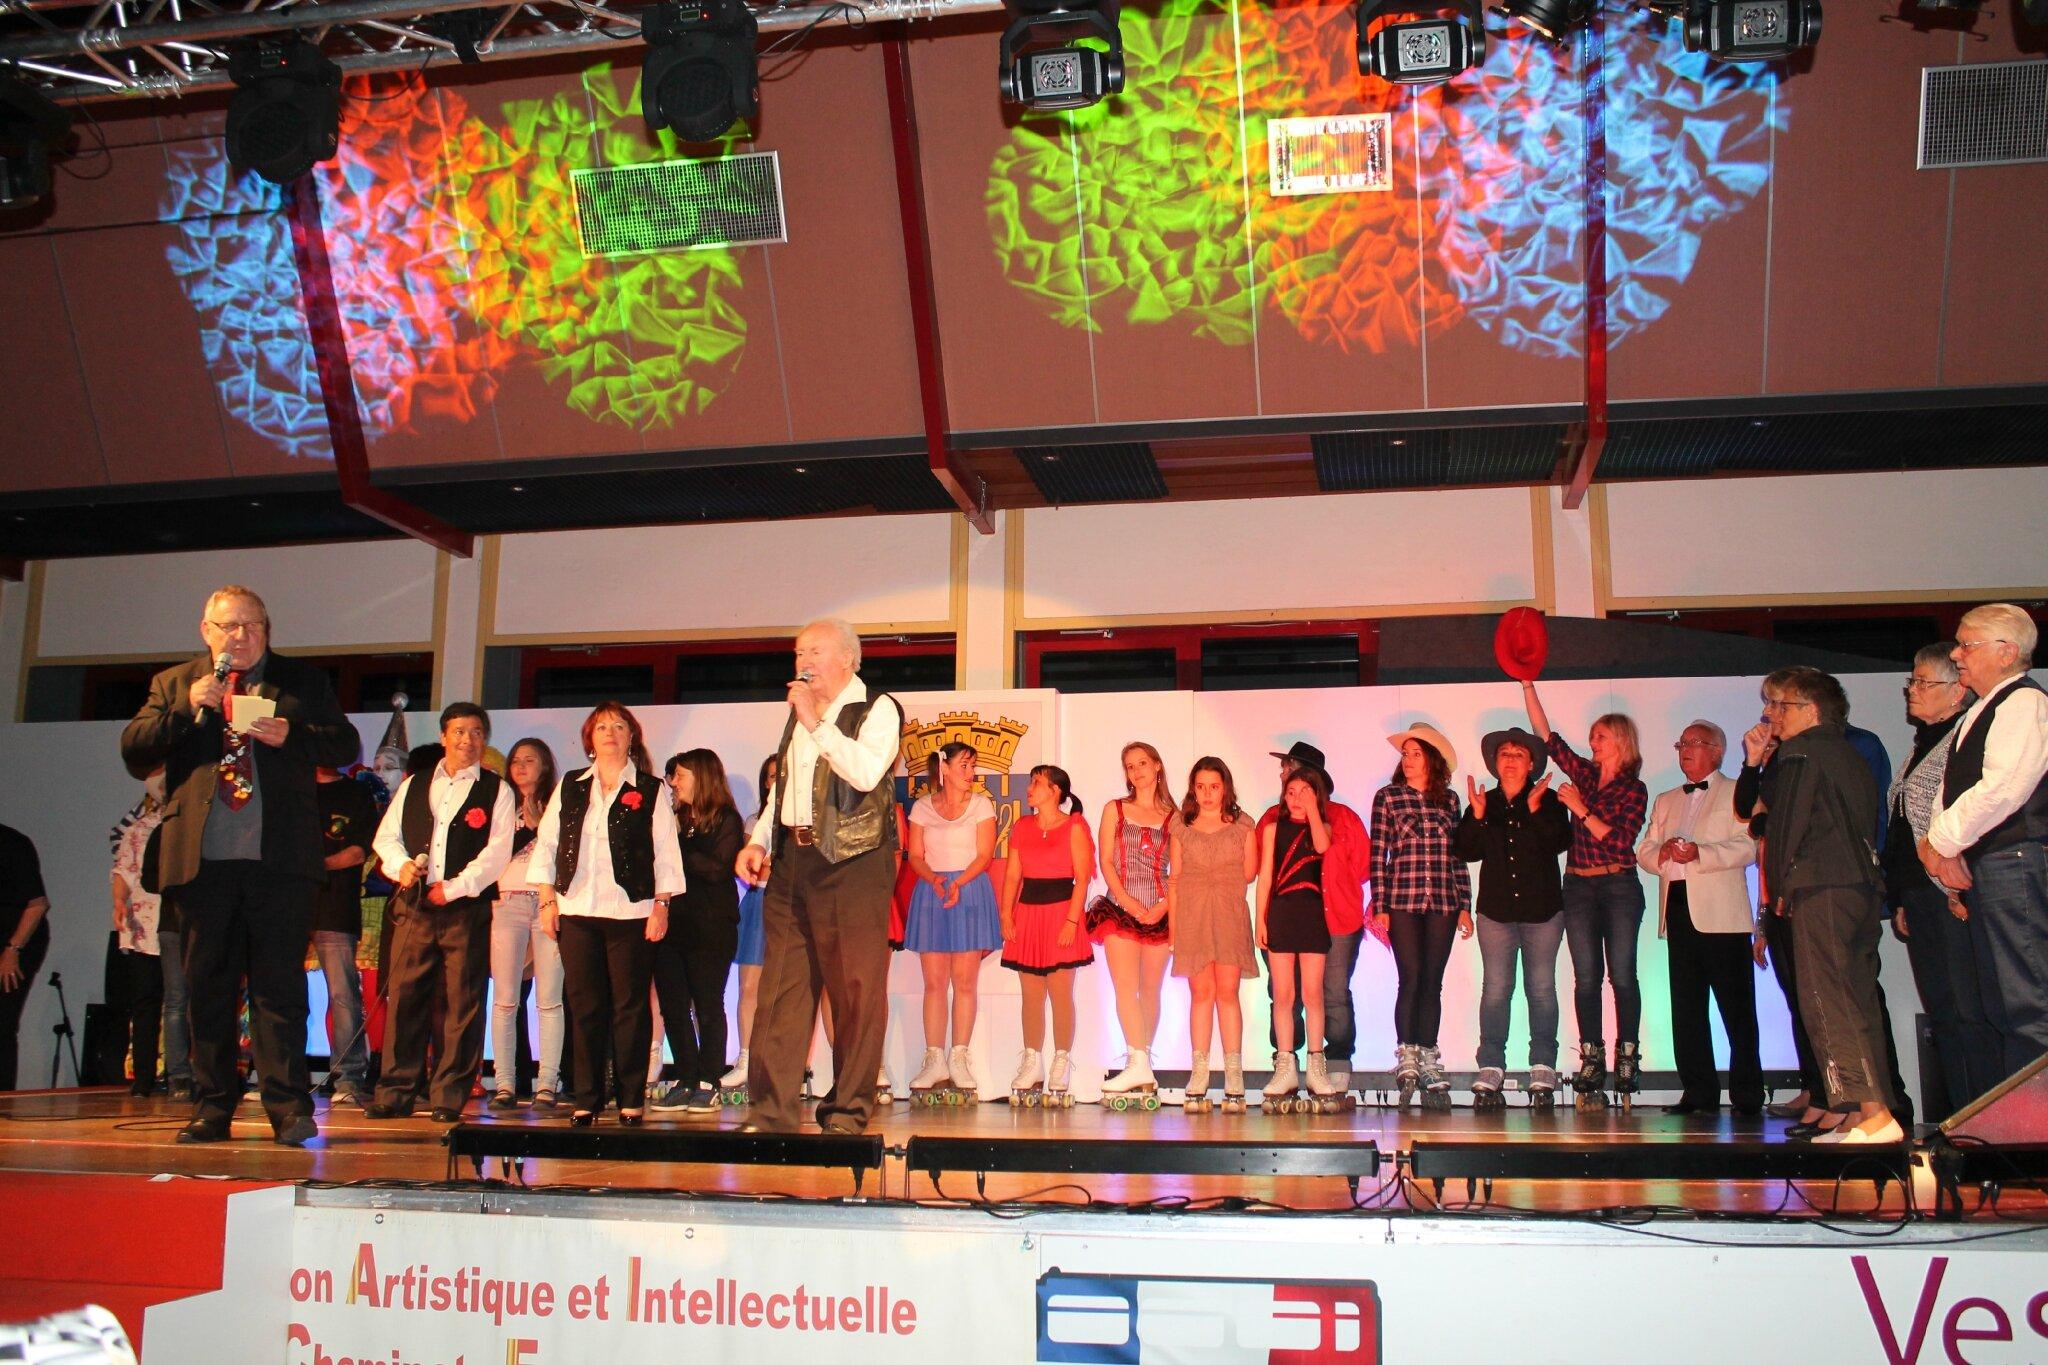 FINAL PRESENTATION DES ARTISTES (8)